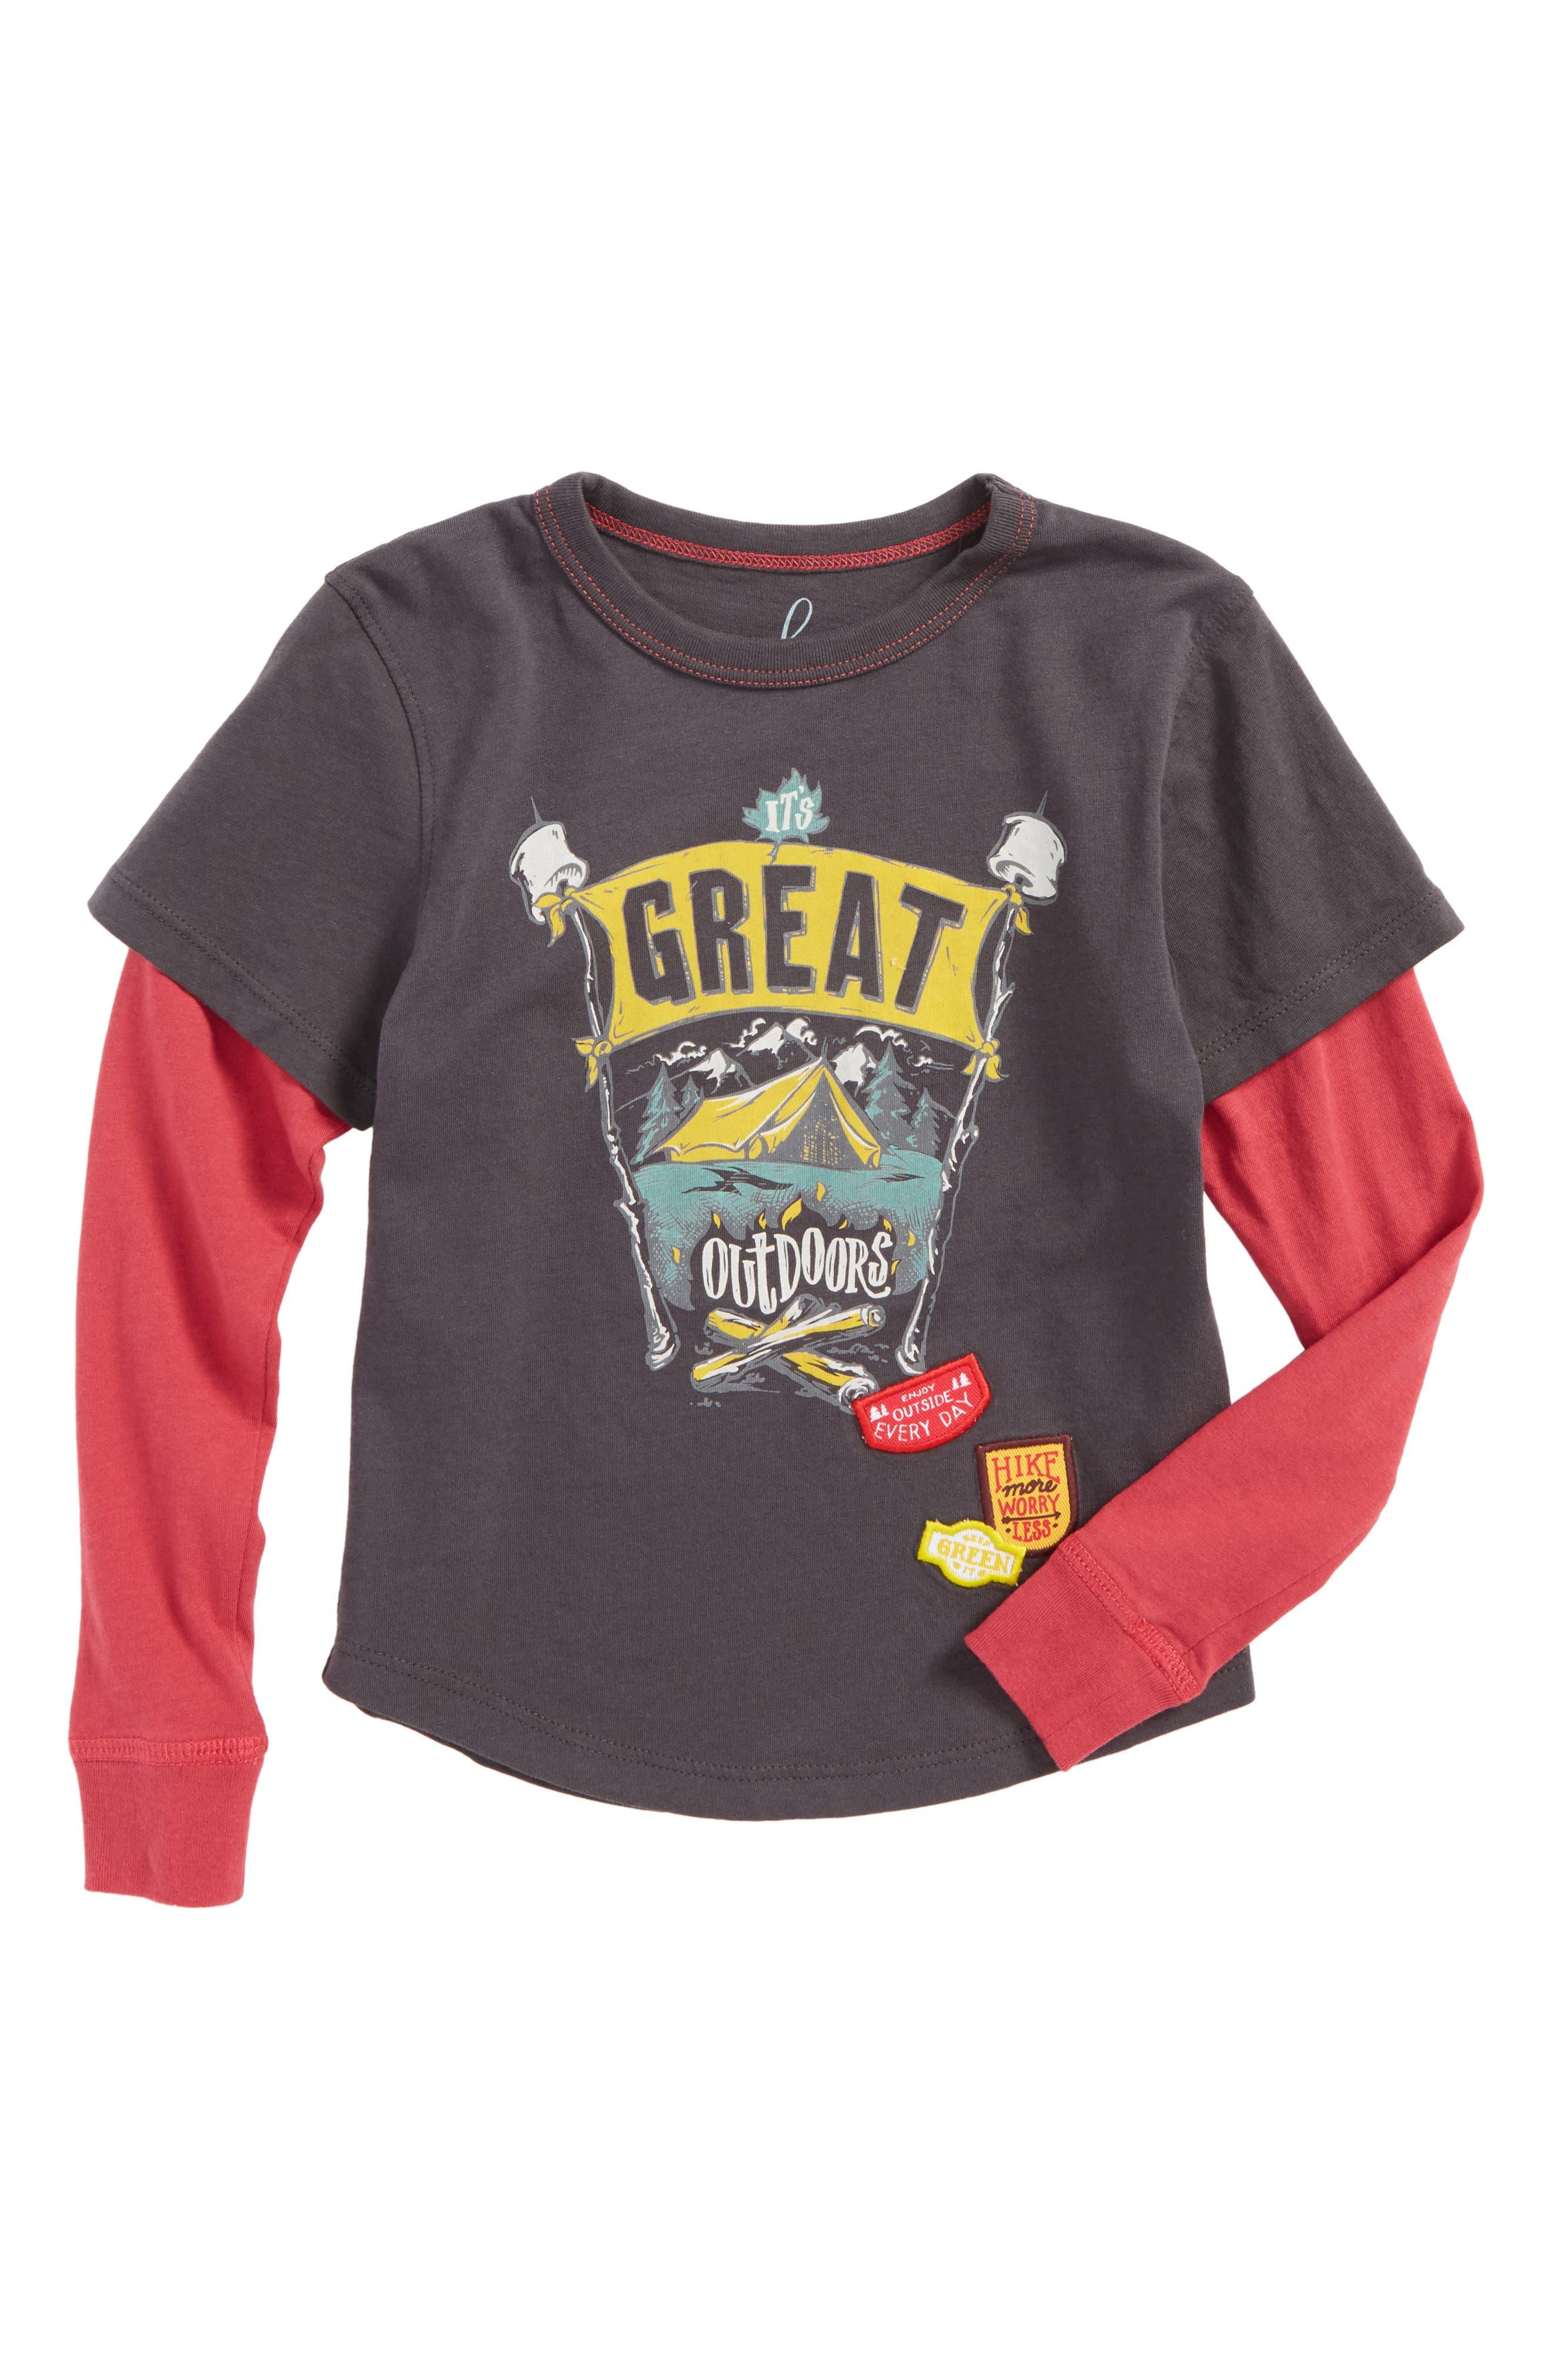 Main Image - Peek Great Outdoors Graphic Layered T-Shirt (Toddler Boys, Little Boys & Big Boys)